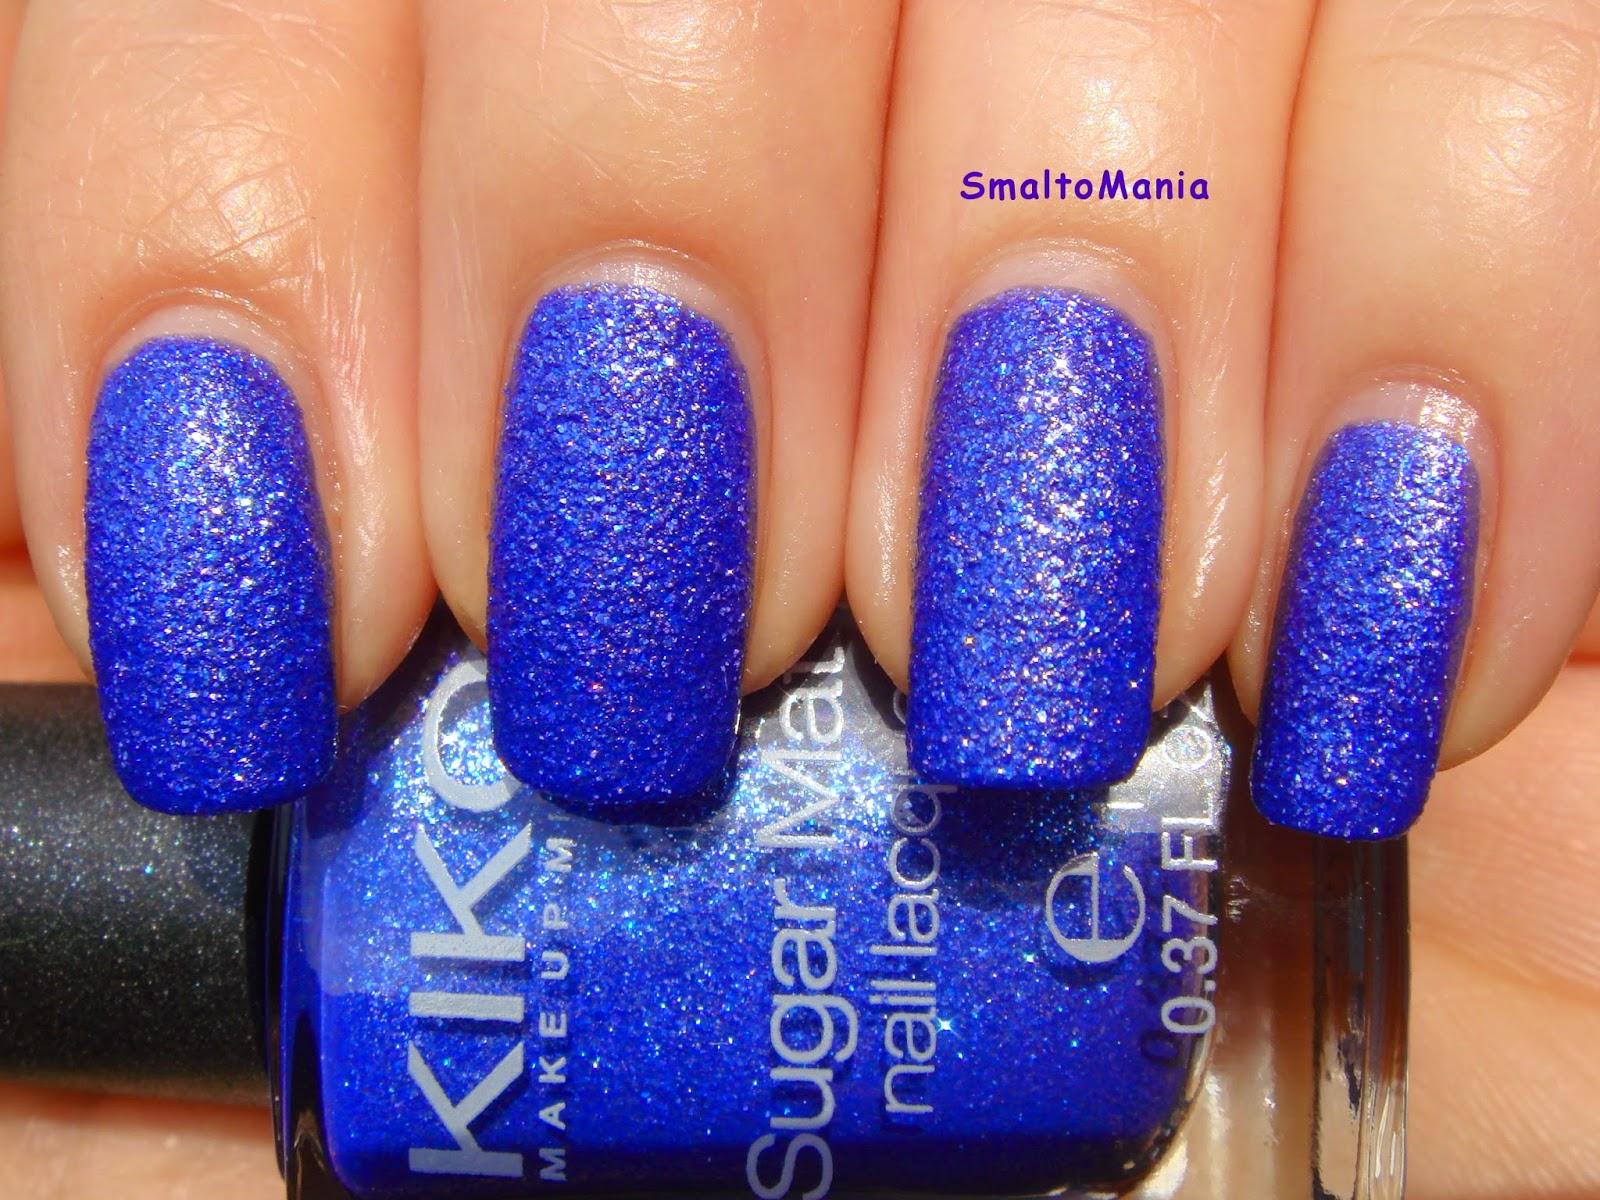 Kiko Sugar Mat n.644 Blu Mare